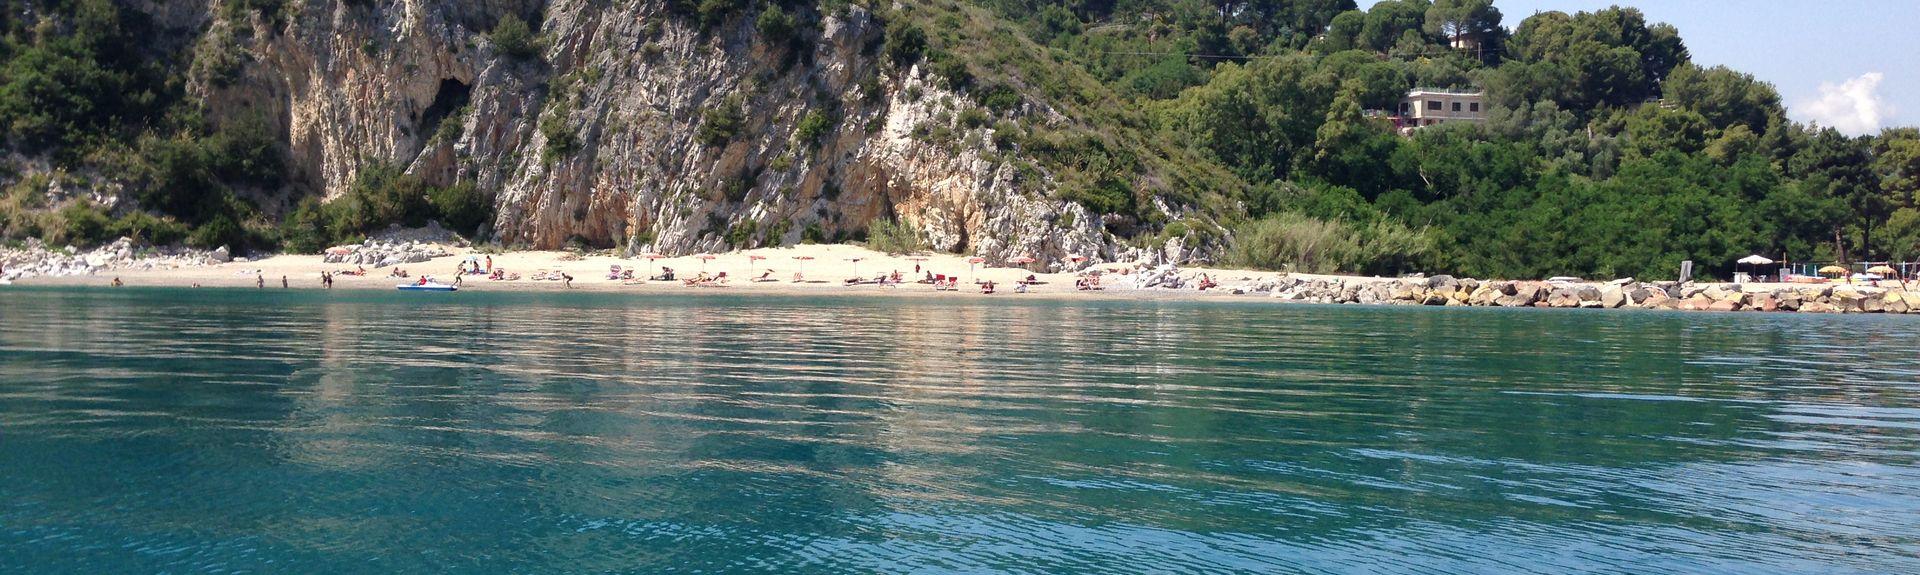 Marina di Camerota, Salerno, Campania, Italy